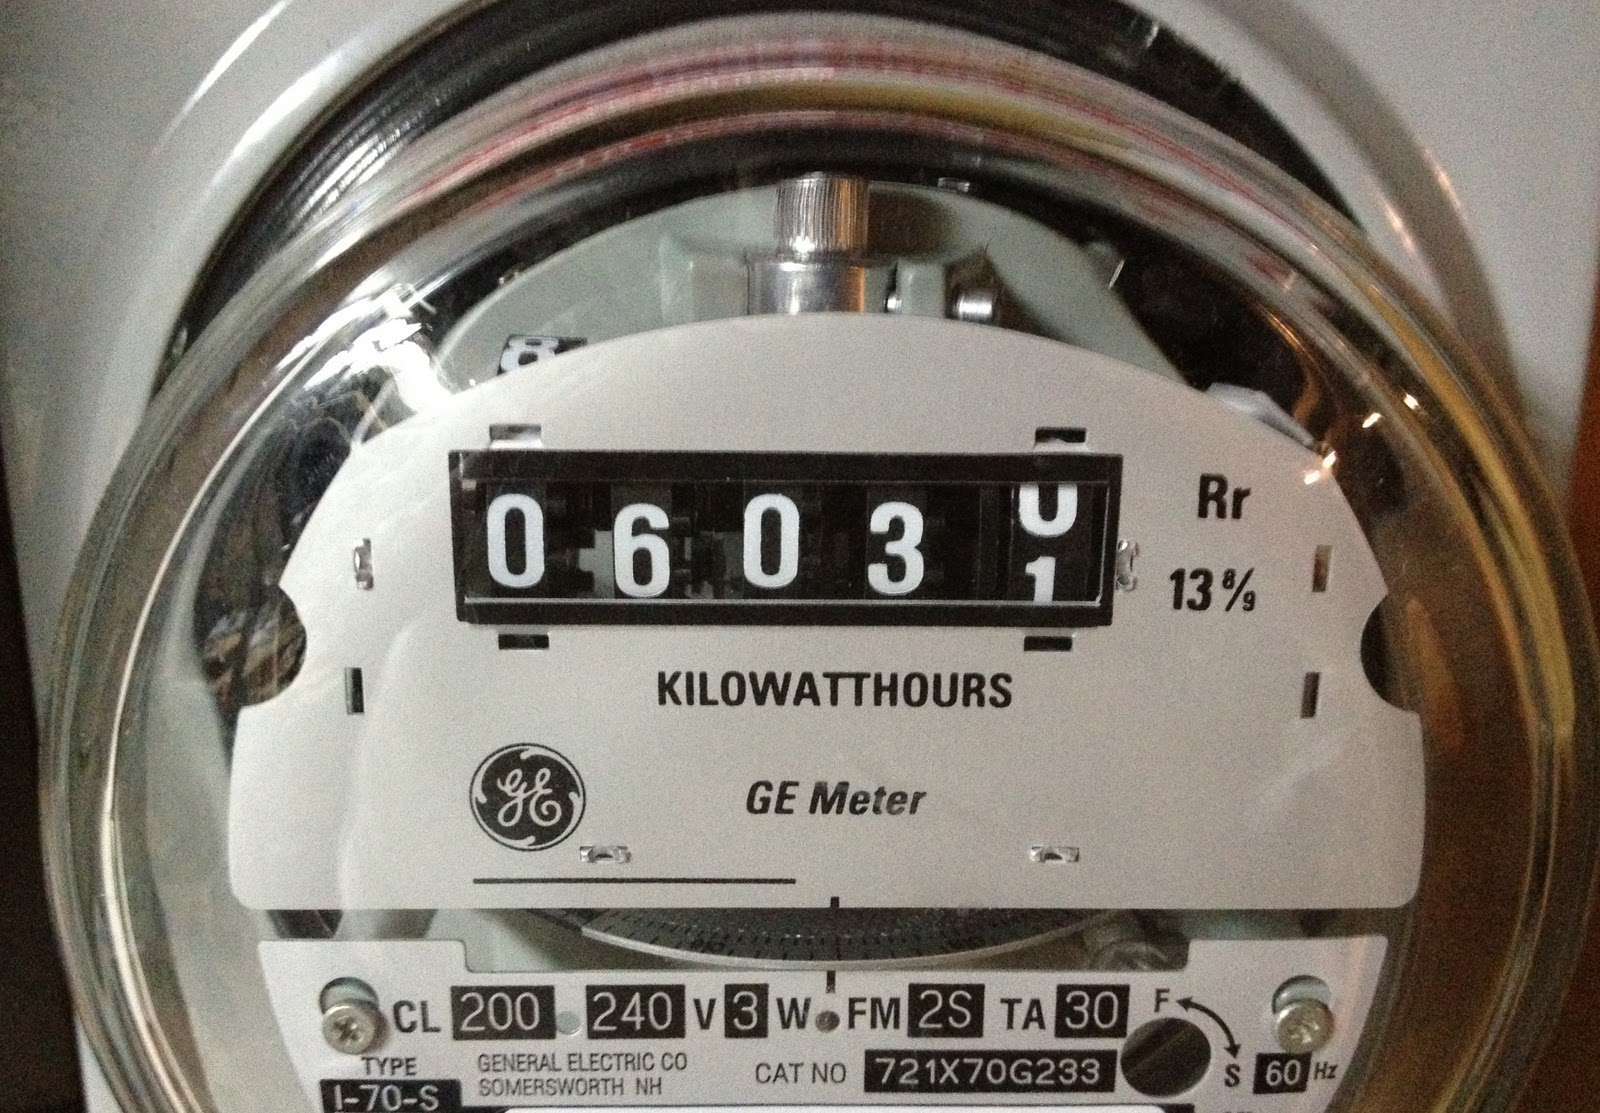 http://4.bp.blogspot.com/-7ZS0XA4WBsk/TxhIjItrEgI/AAAAAAAACrg/kJ7Sgr4Po6g/s1600/Solar%2BMeter.jpg